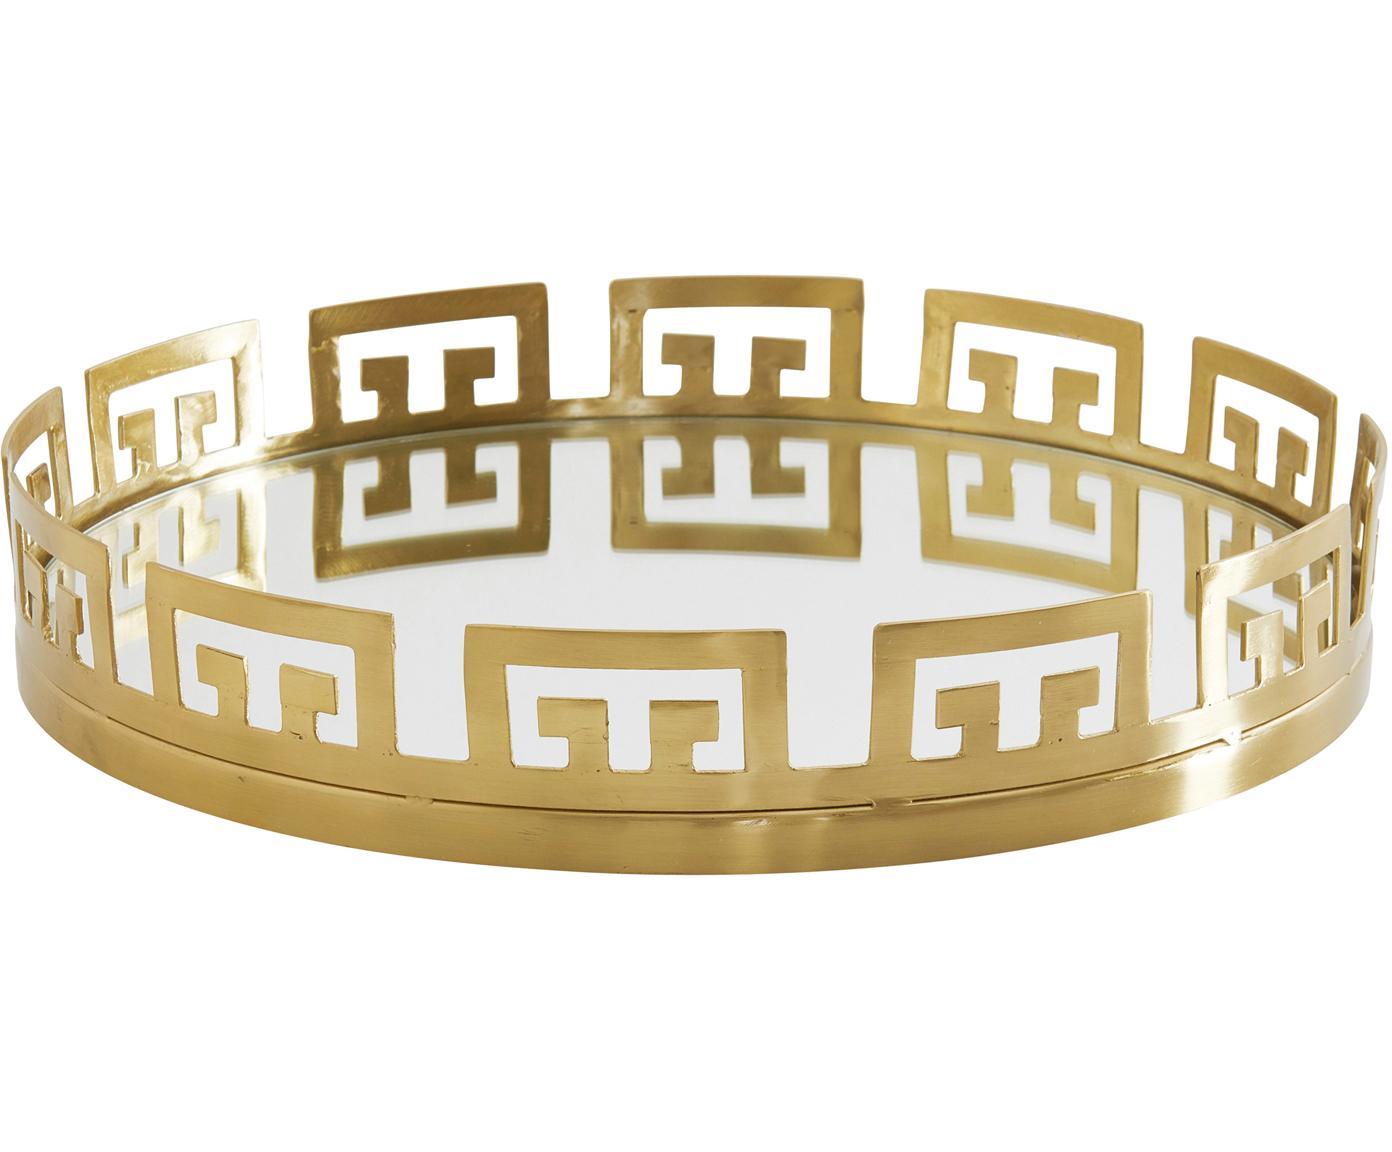 Tablett Mallis, Rahmen: Metall, beschichtet, Messingfarben, Spiegelglas, Ø 42 cm